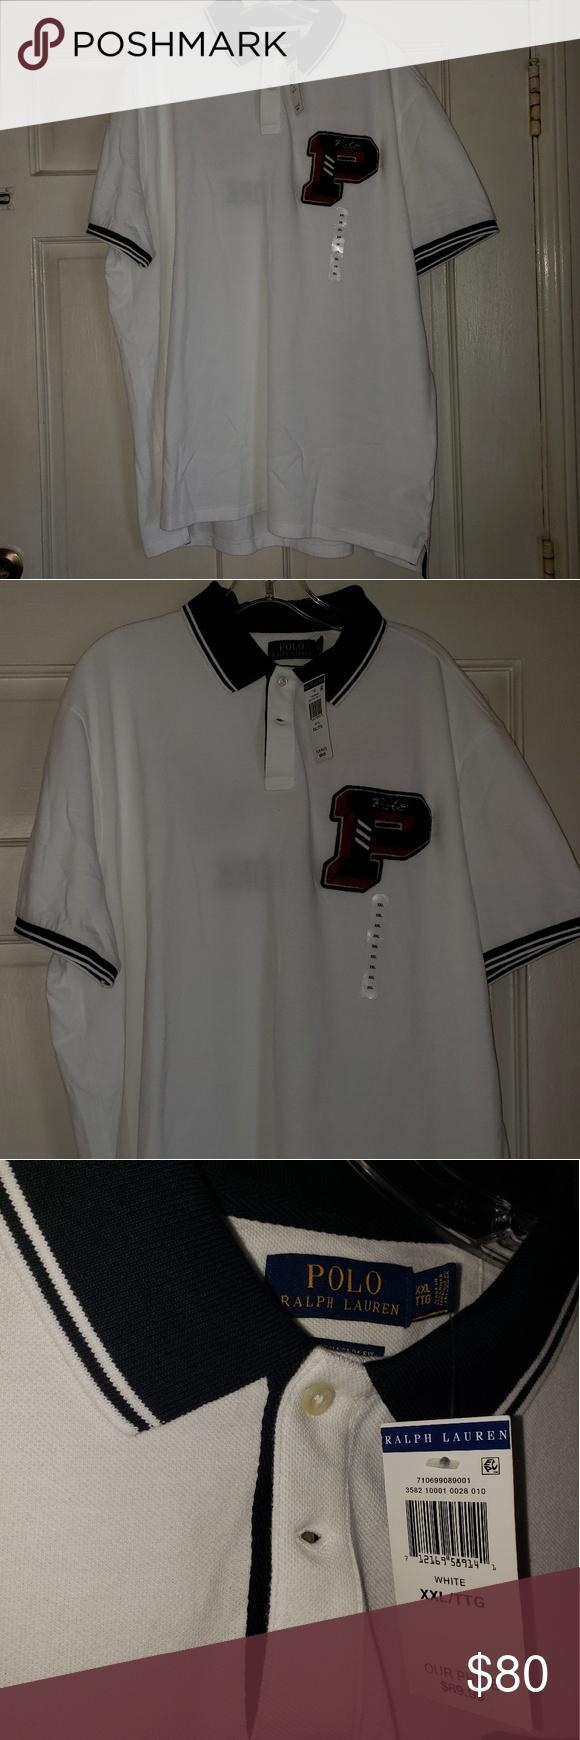 Nwt Polo Ralph Lauren Sp Edition Polo Shirt Nwt In 2018 My Posh